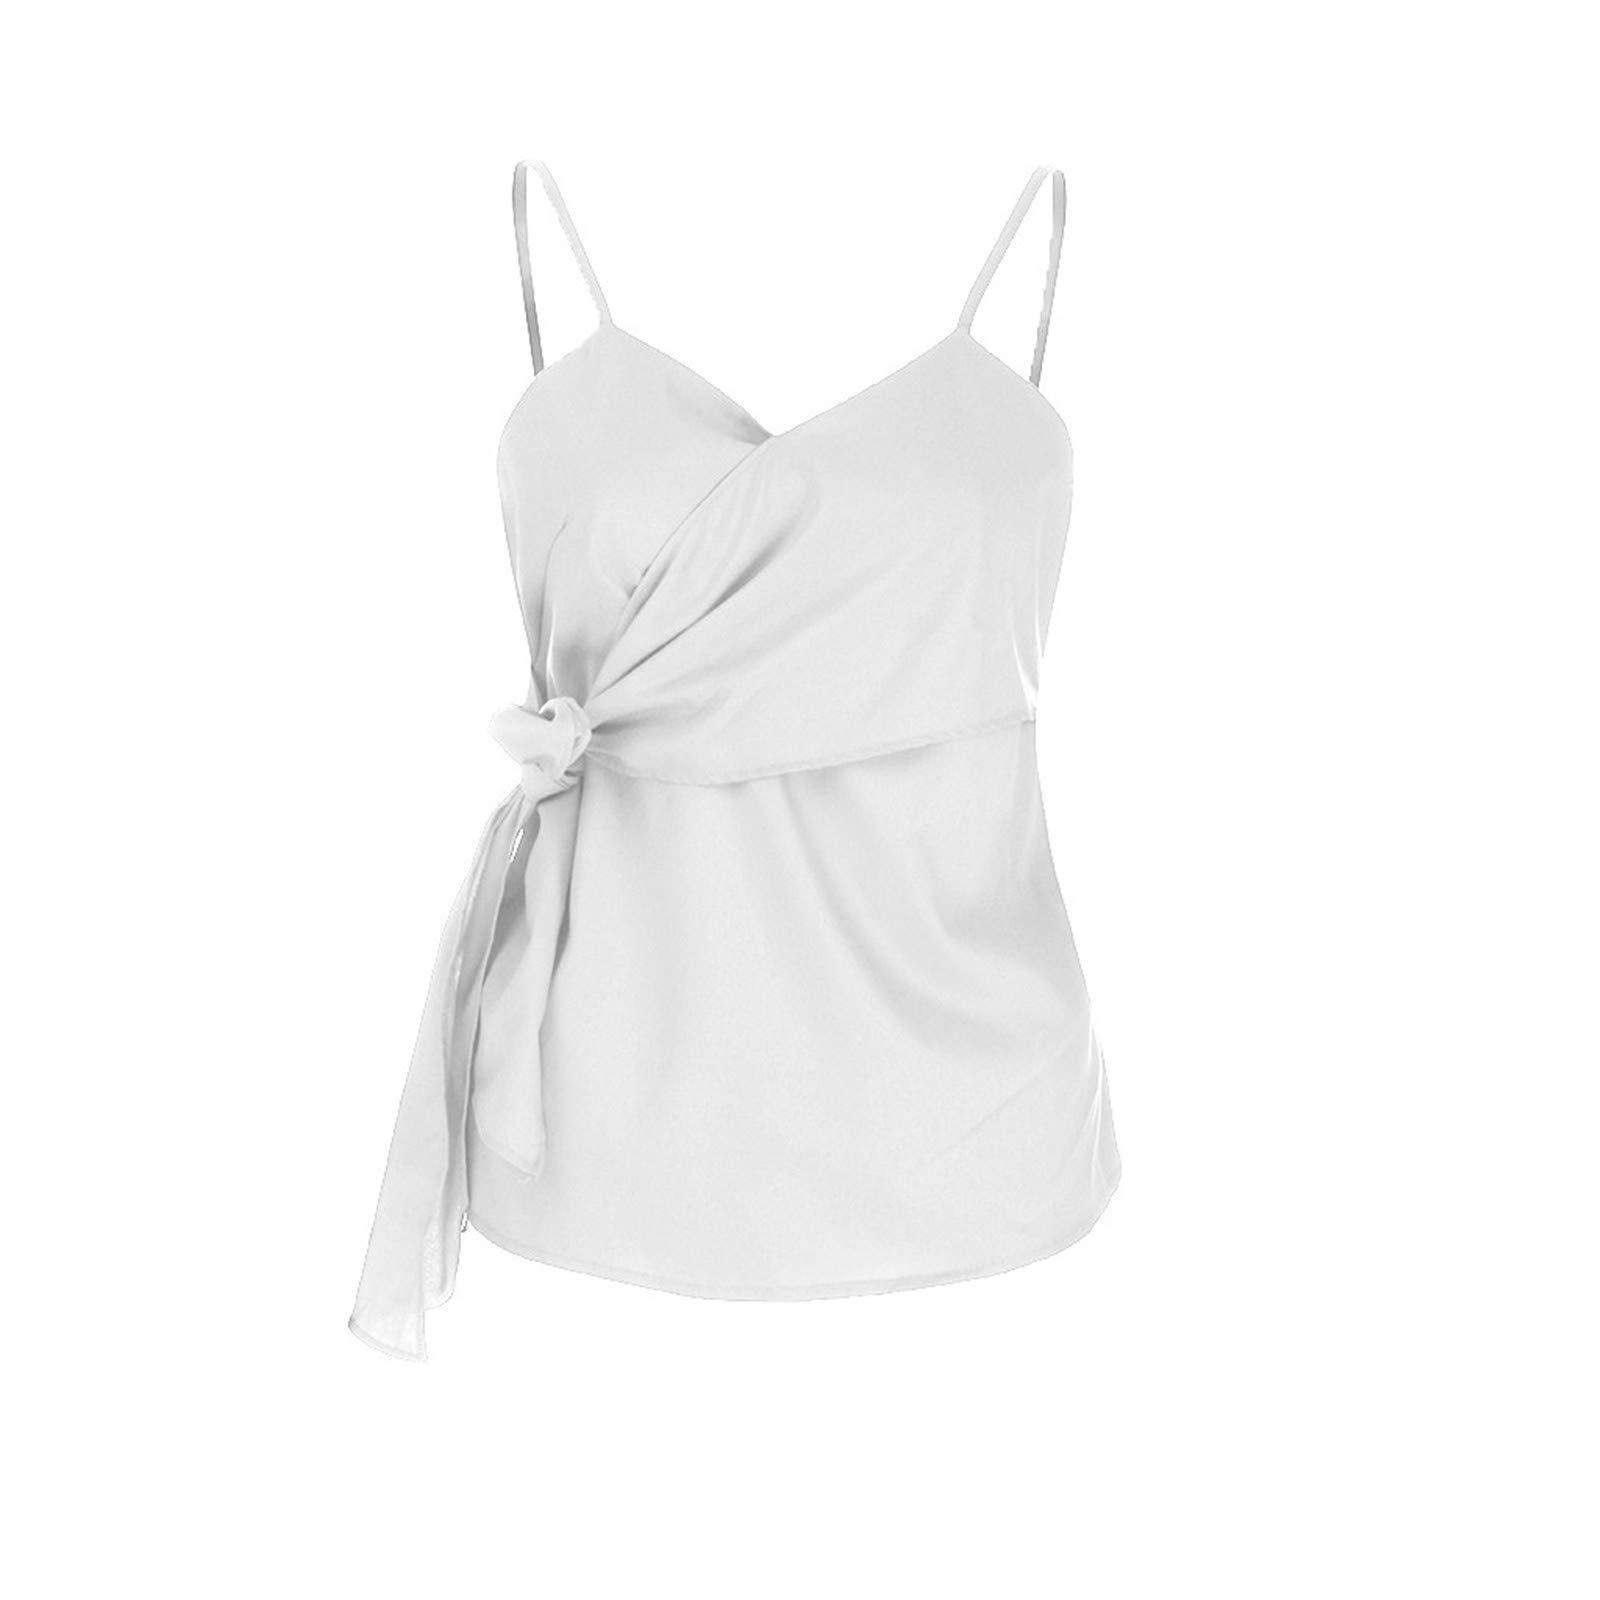 BAOHOKE Summer Fashion Casual Sleeveless Crop Solid Bandage Tops,Vest Sling,t Shirt Tops Blouse v Neck (White,S)